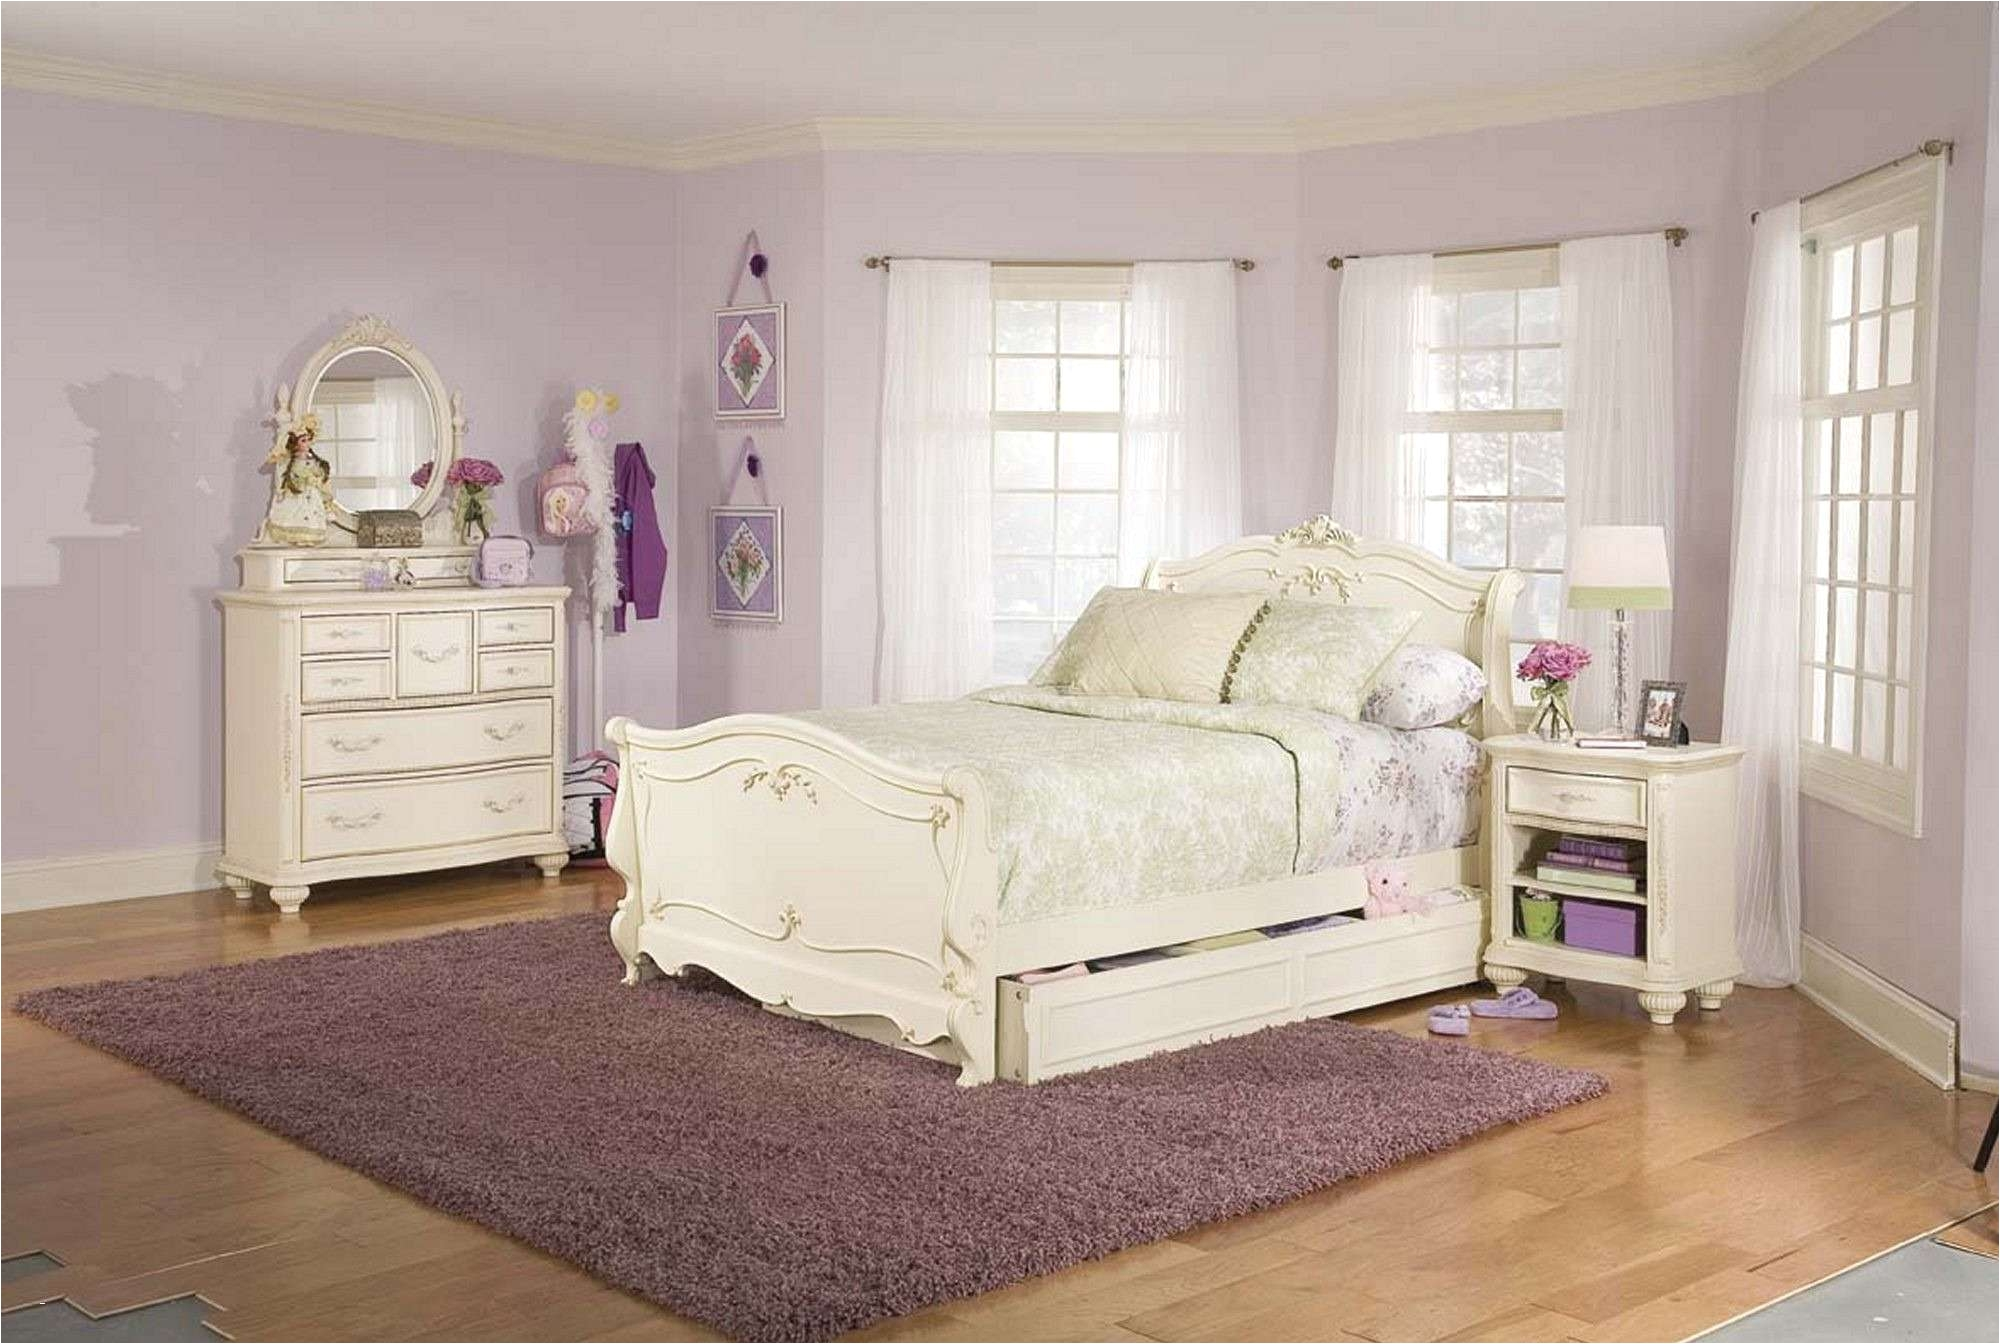 ethan allen bedroom furniture collections adams furniture bedroom set new stylish ethan allen bedroom sets bemalas - Ethan Allen Bedroom Furniture